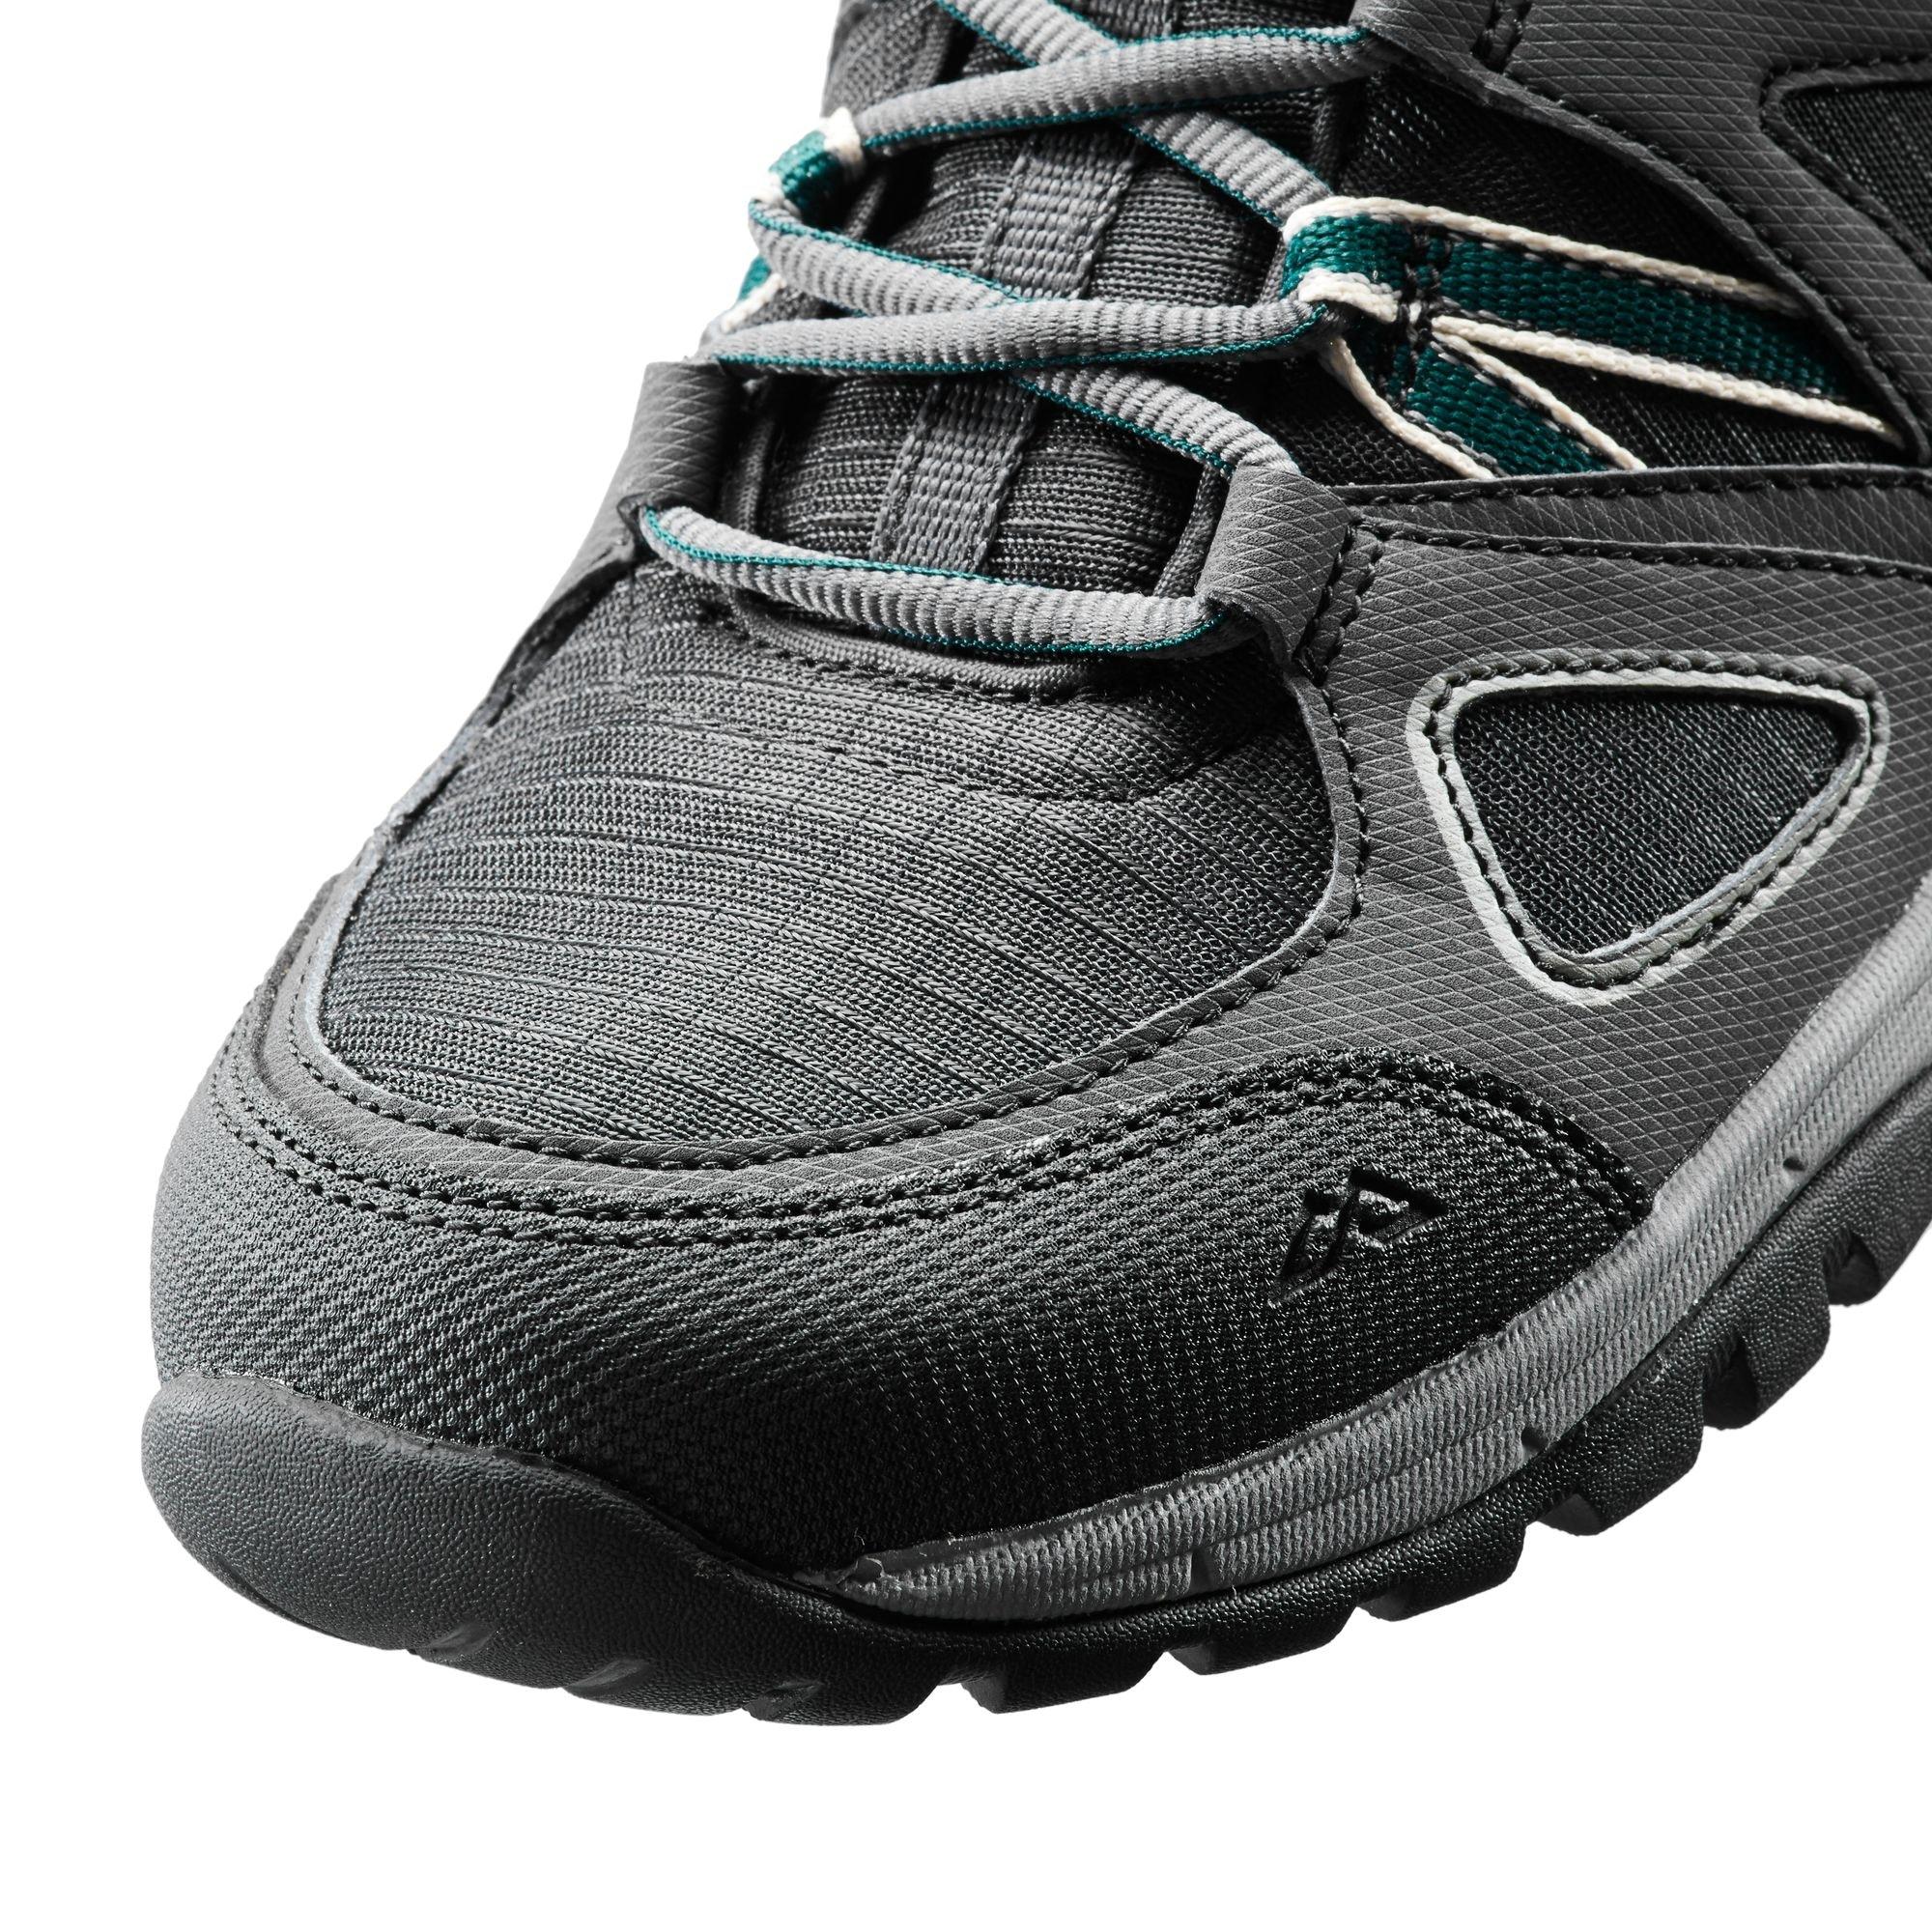 NEW-Kathmandu-Serpentine-II-Men-039-s-Lighweight-Durable-Hiking-Walking-Shoes thumbnail 8